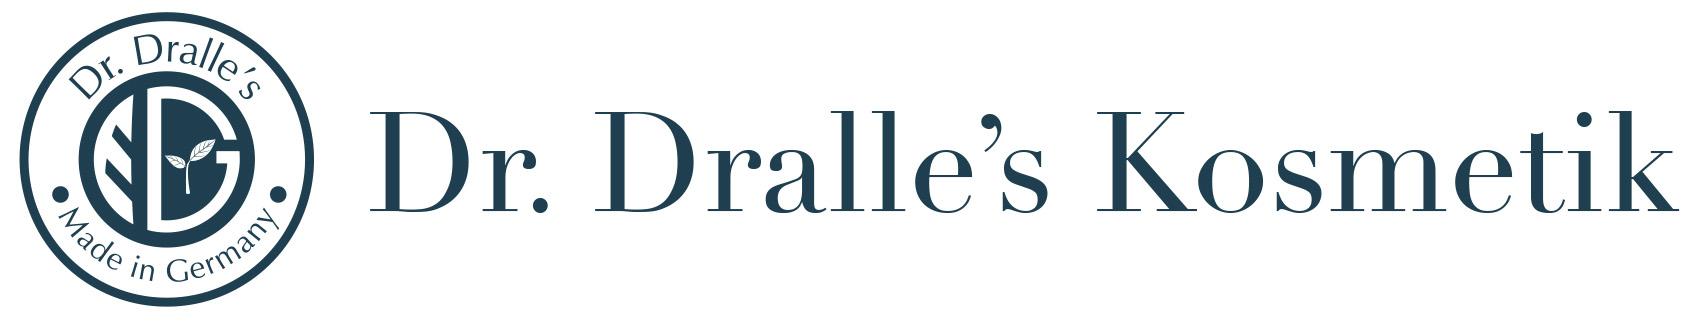 Dr. Dralles